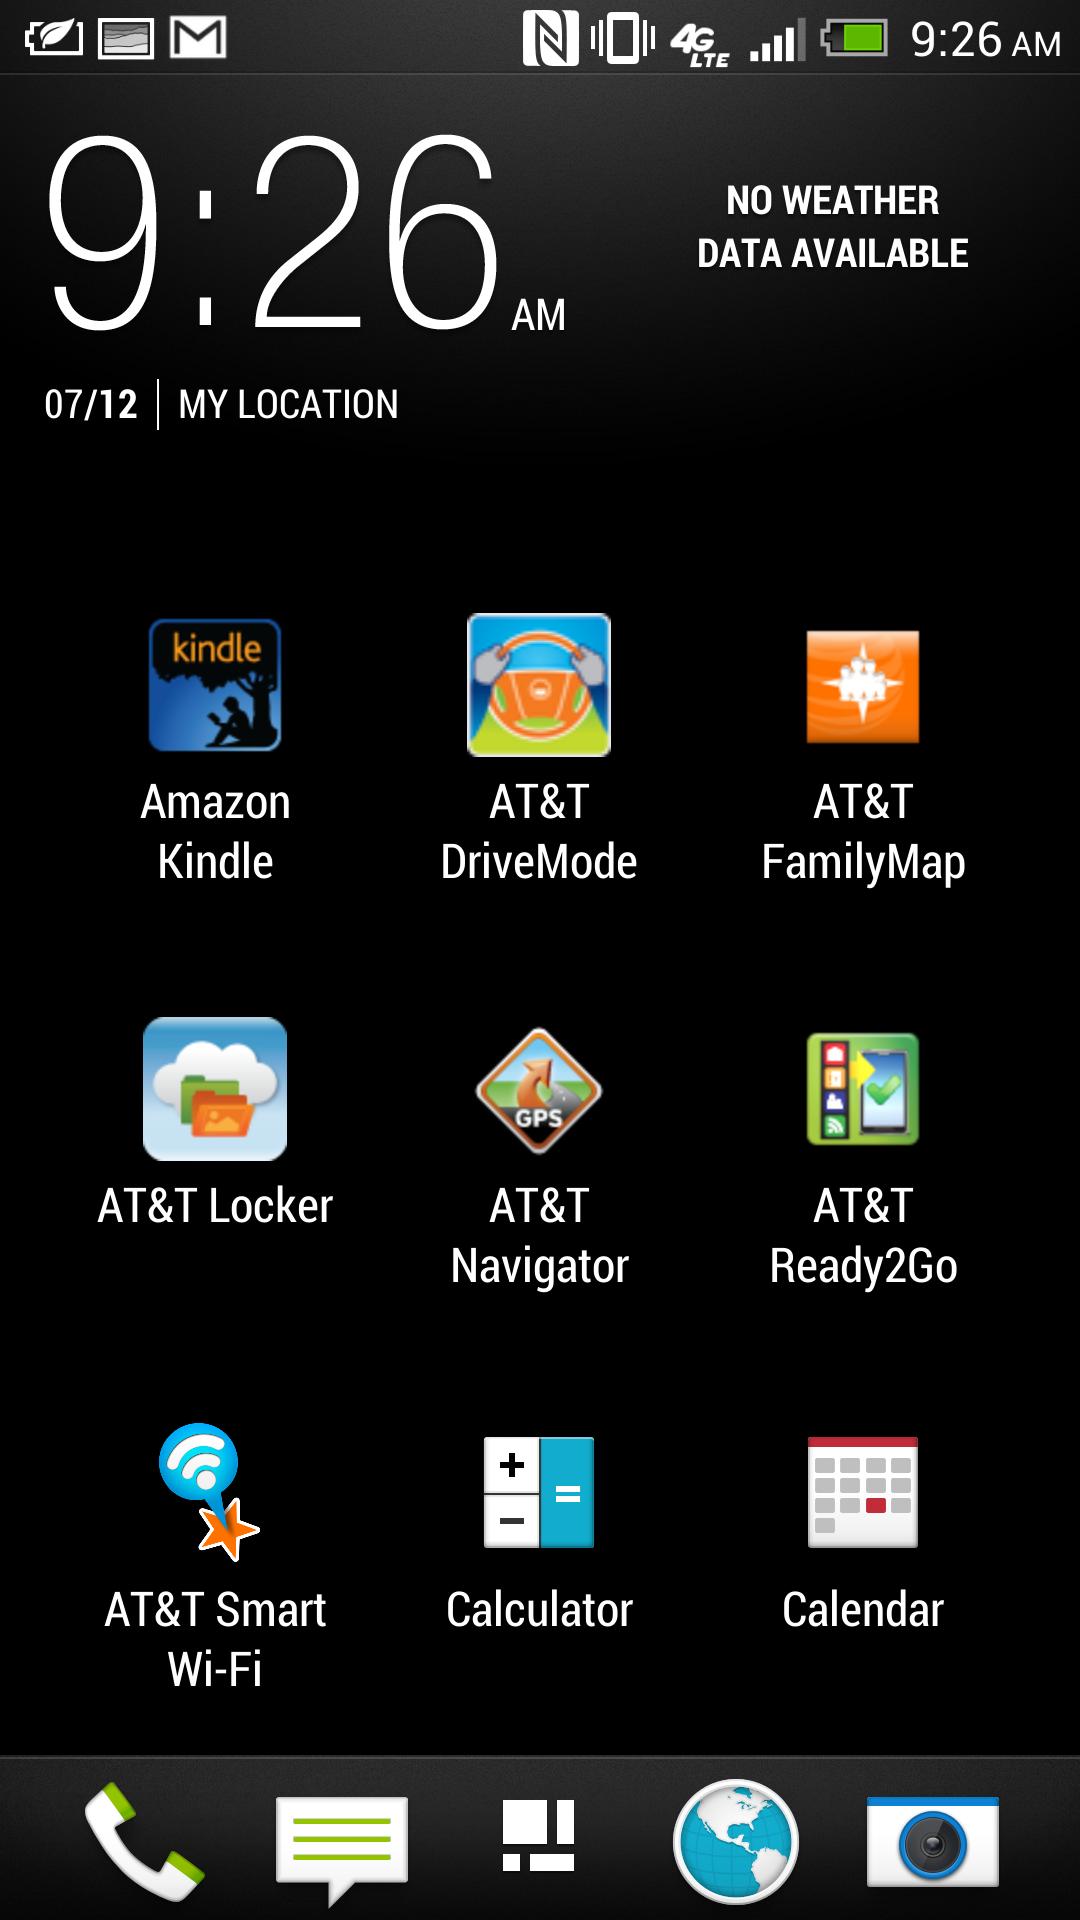 HTC's Sense 5 interface overlay.